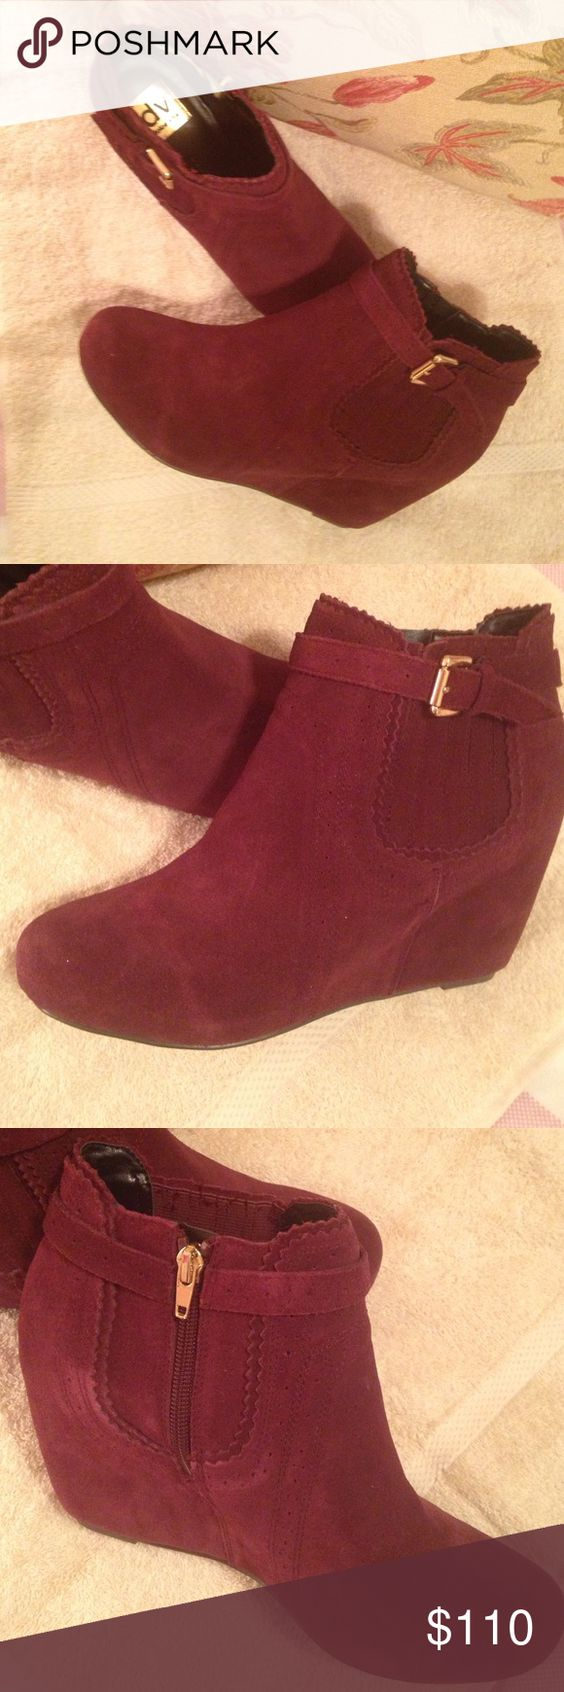 ⚡️New Price⚡️ Dolce Vita Bootie Bordeaux Suede Boots Dolce Vita Shoes Ankle Boots & Booties